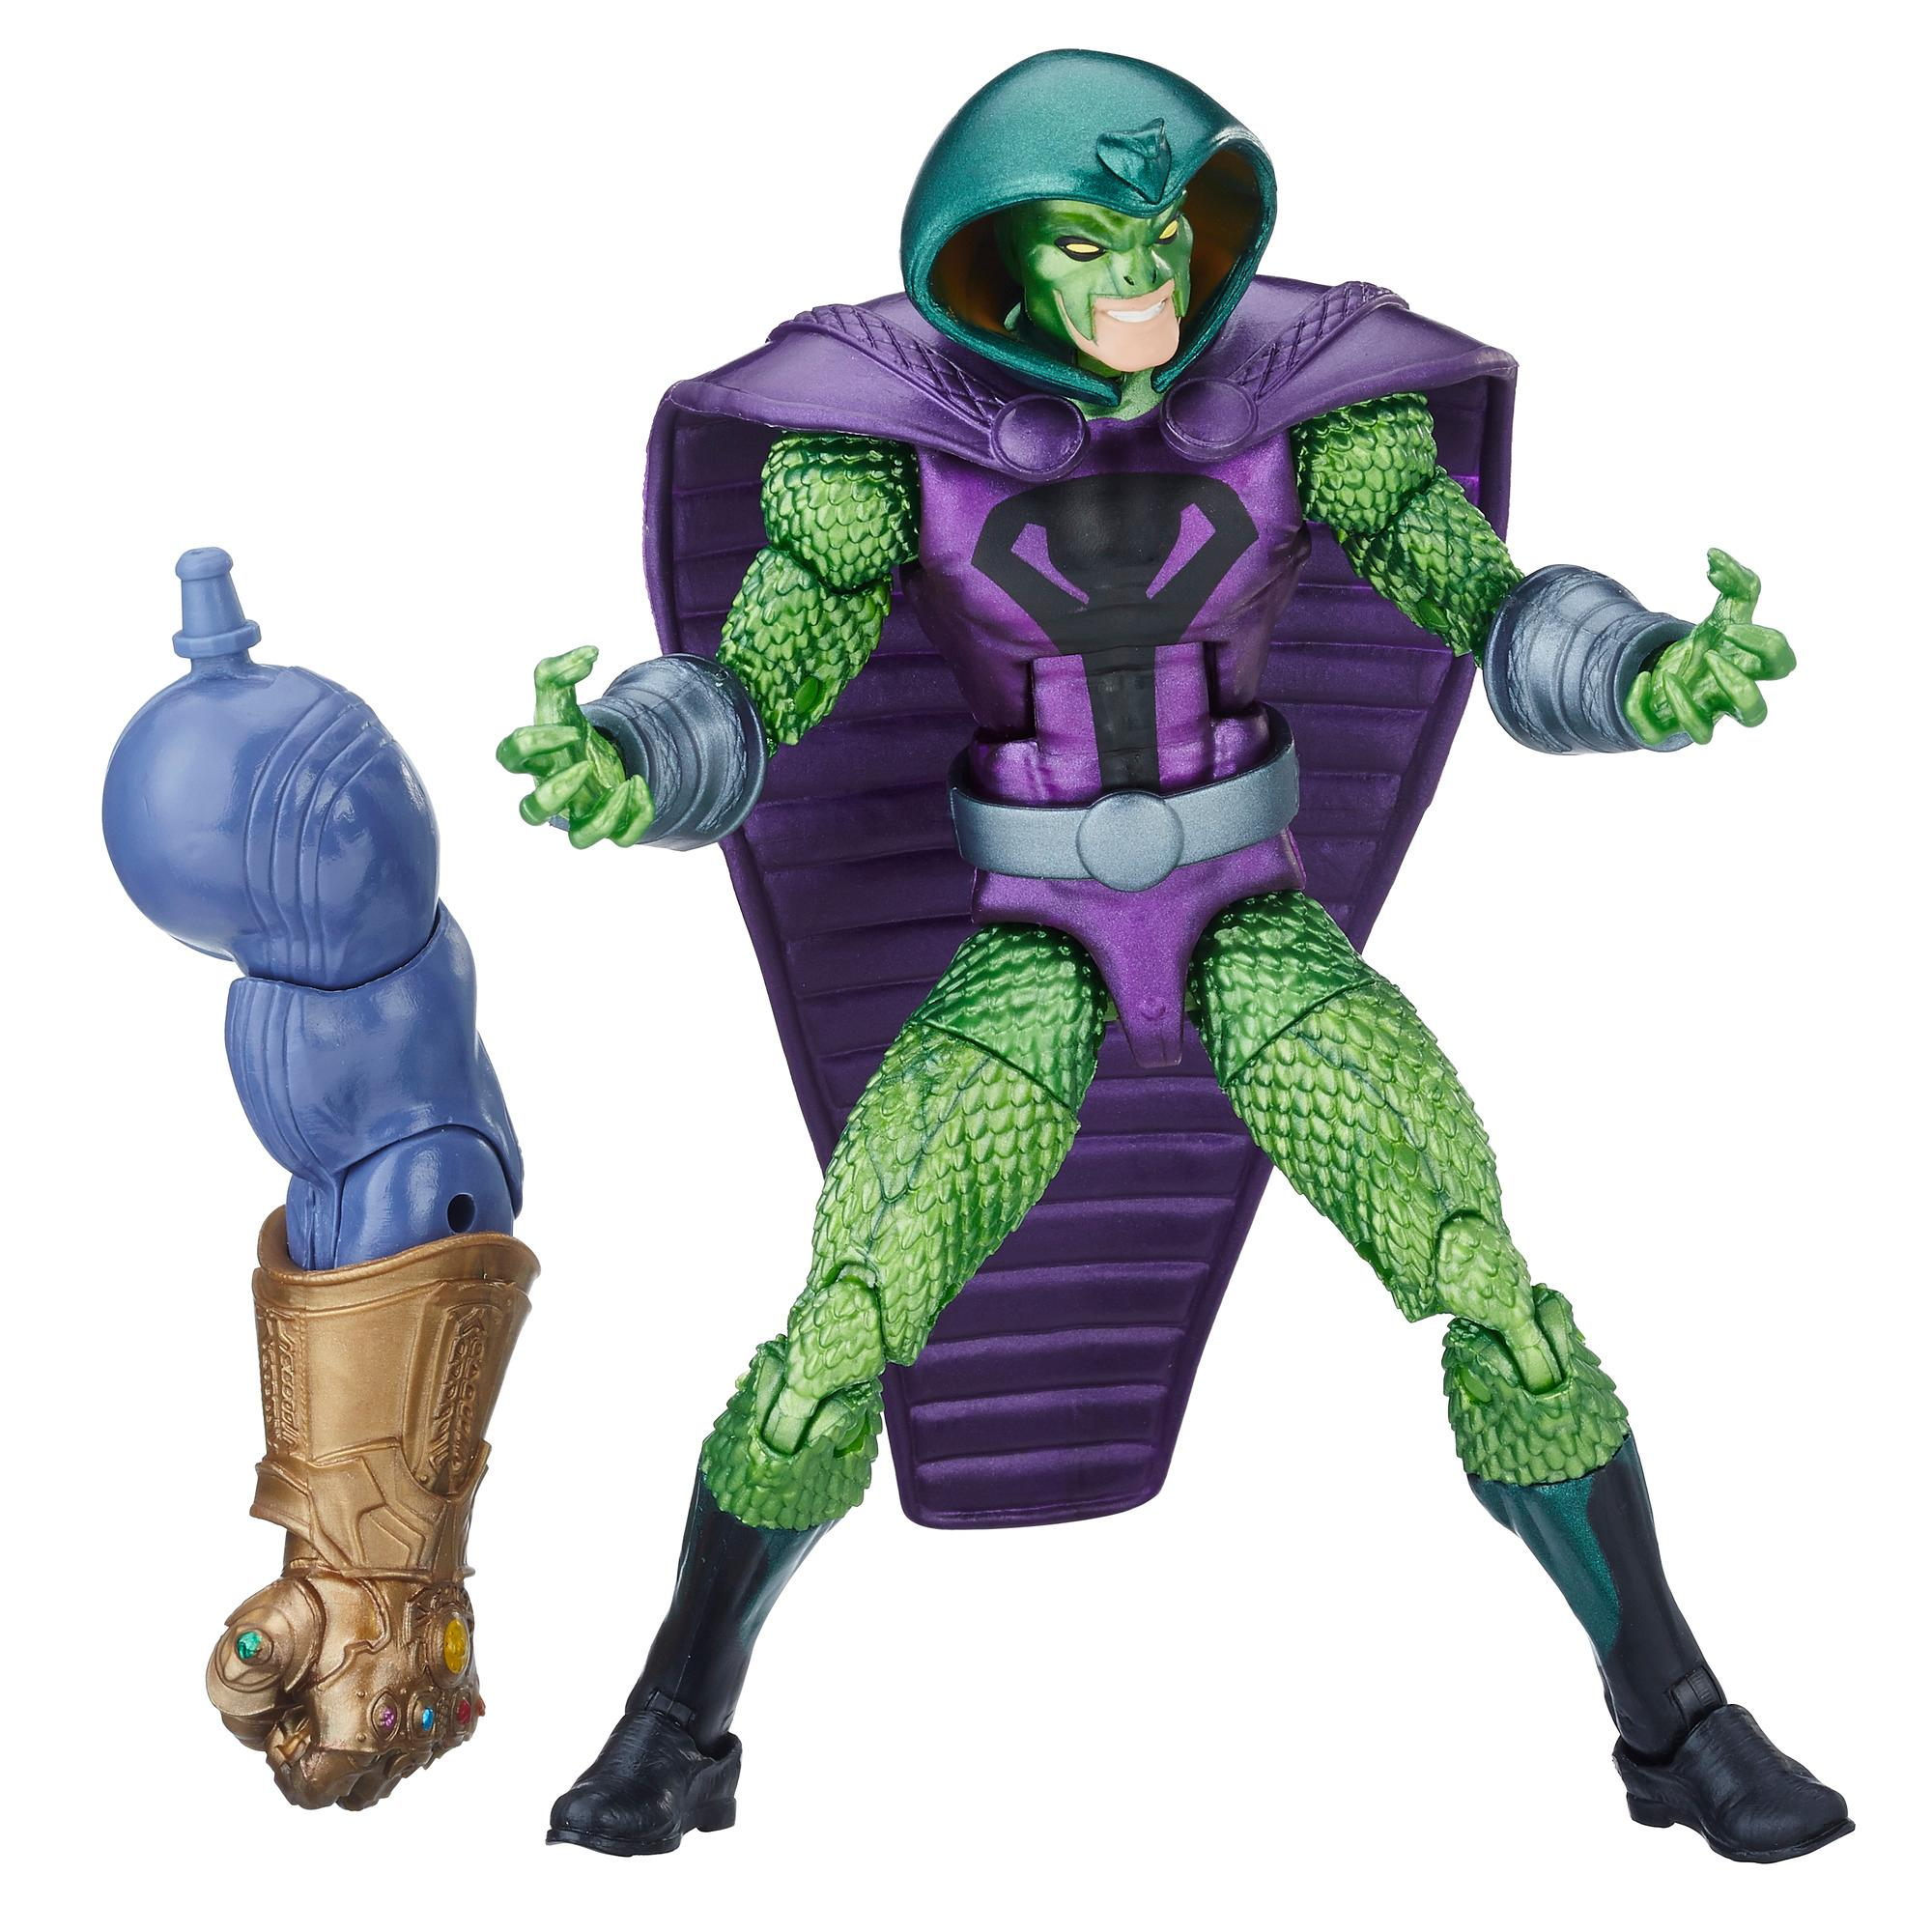 Marvel Legends - Serpent Society (Build-A-Figure Thanos Action Figure Collezione, 15 cm)